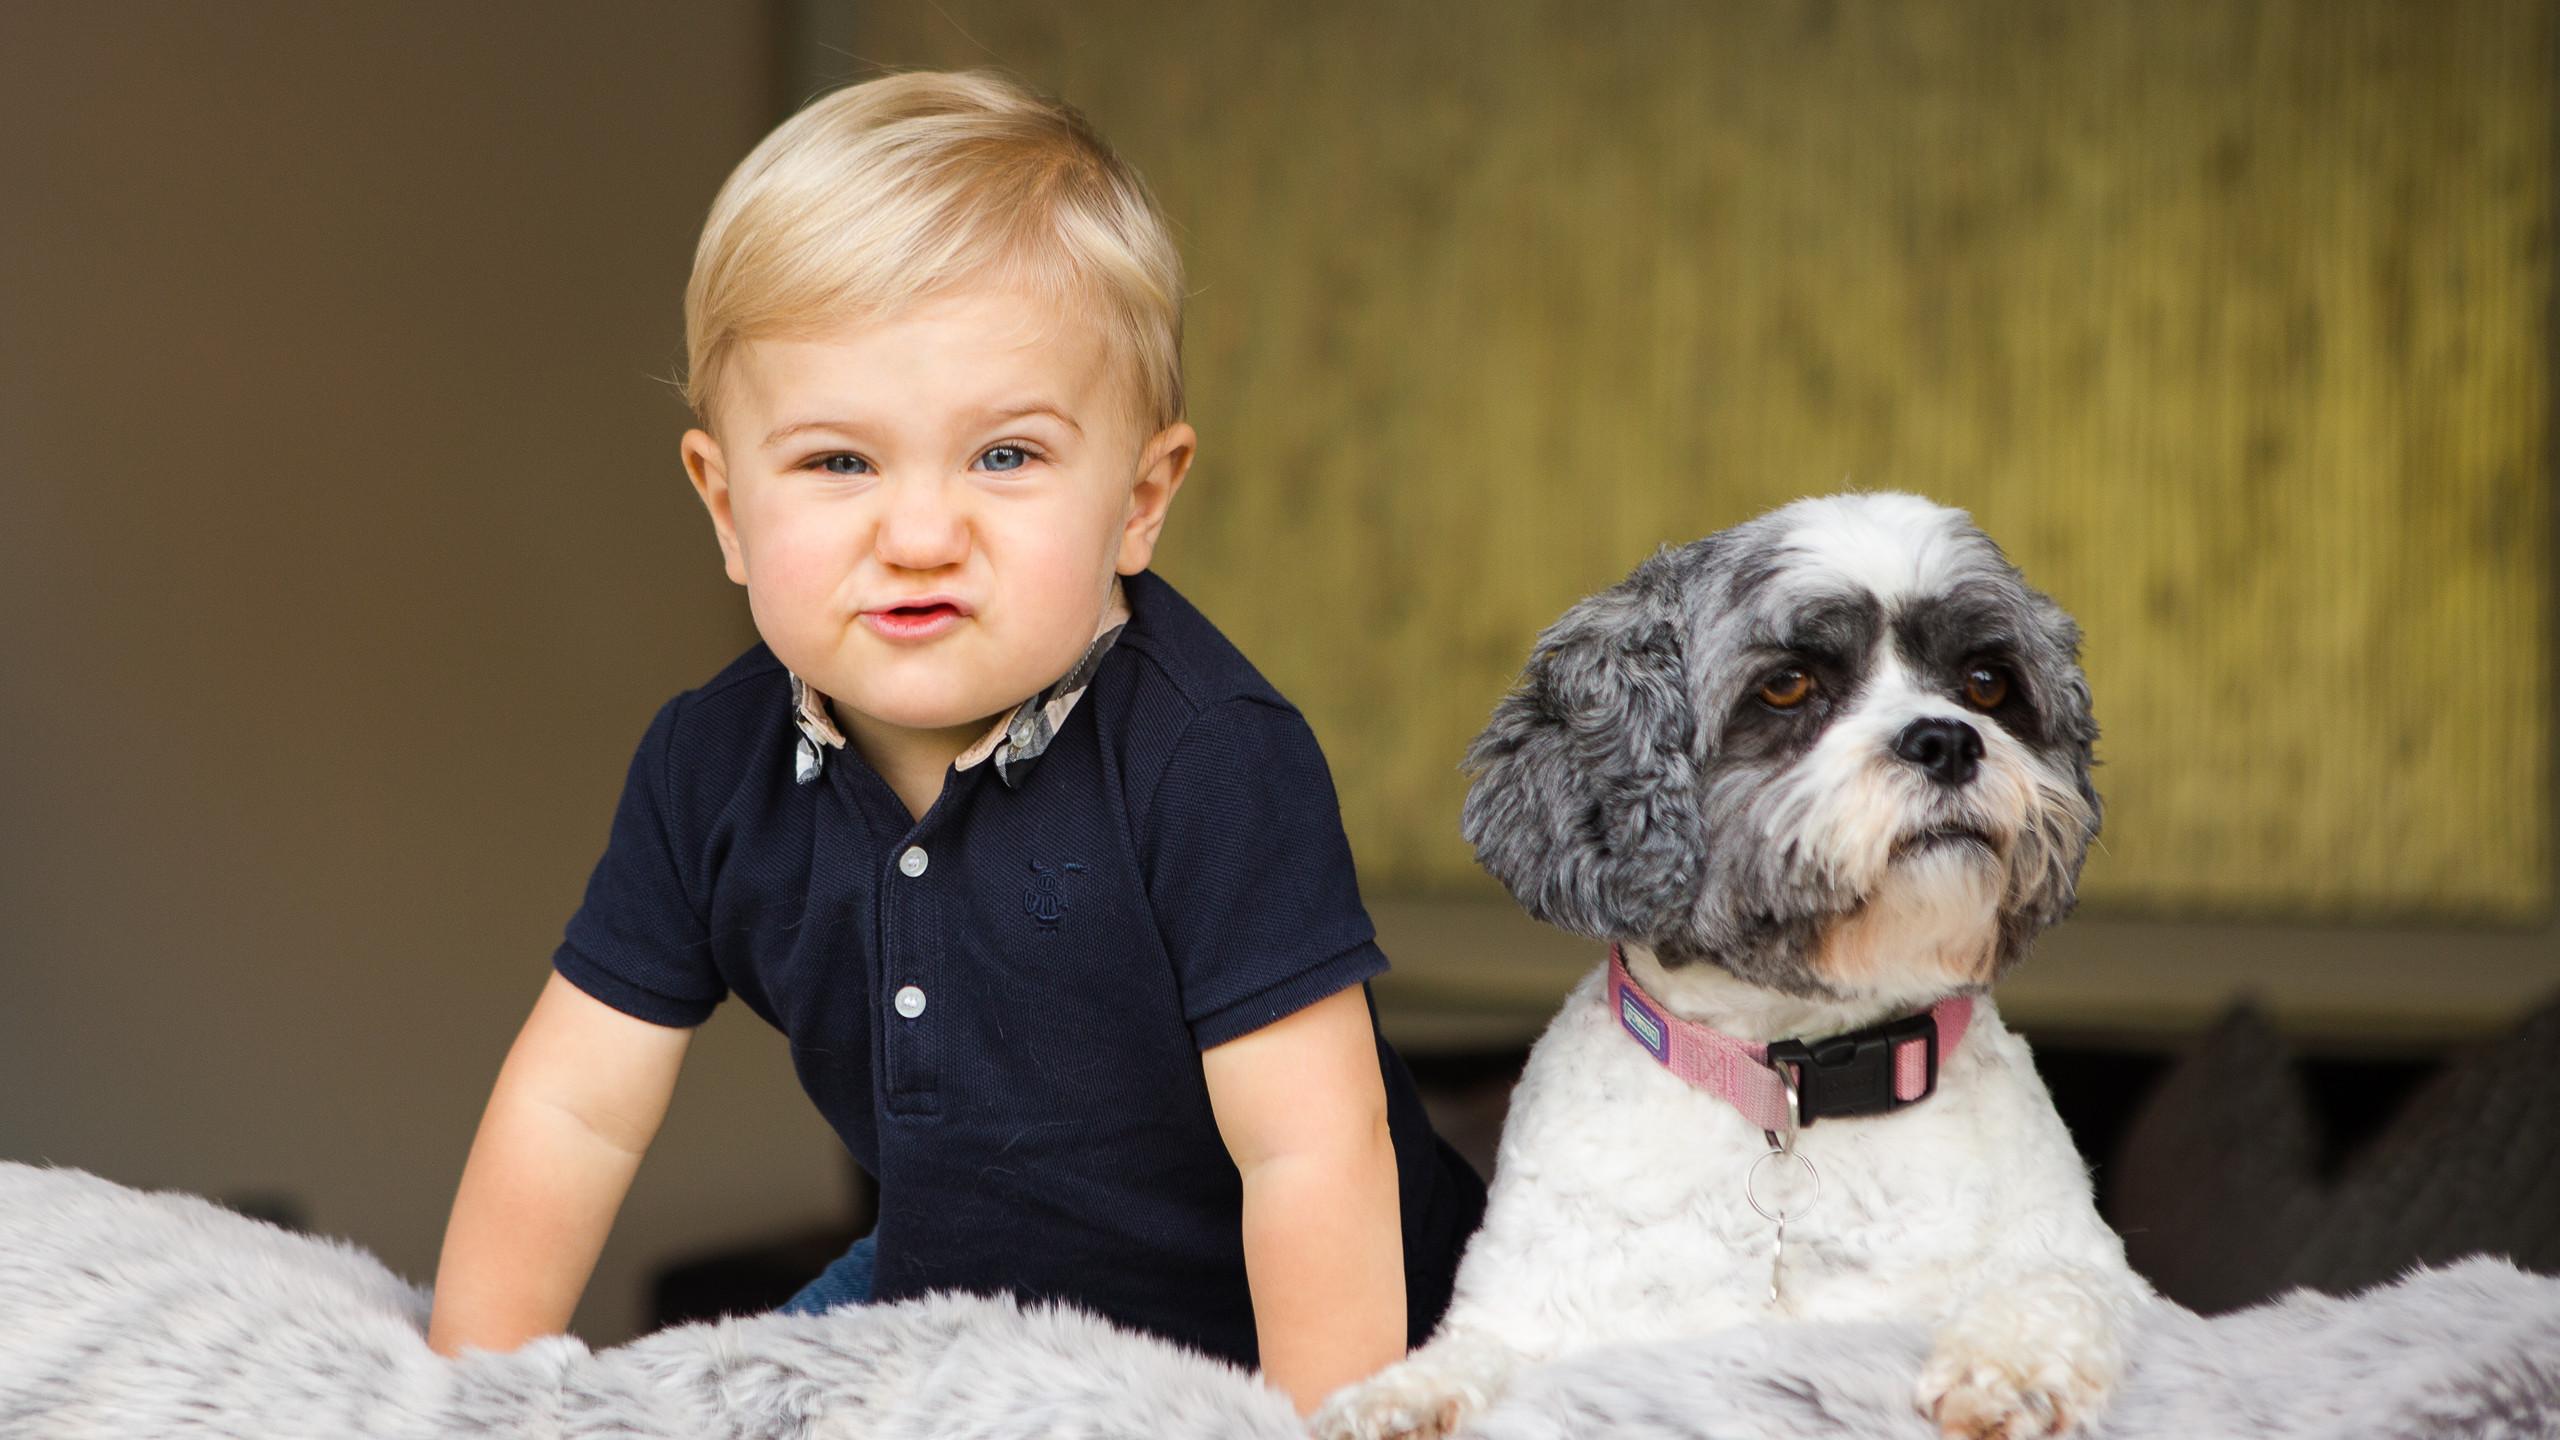 Toddler Lifestyle Photoshoot Cheeky